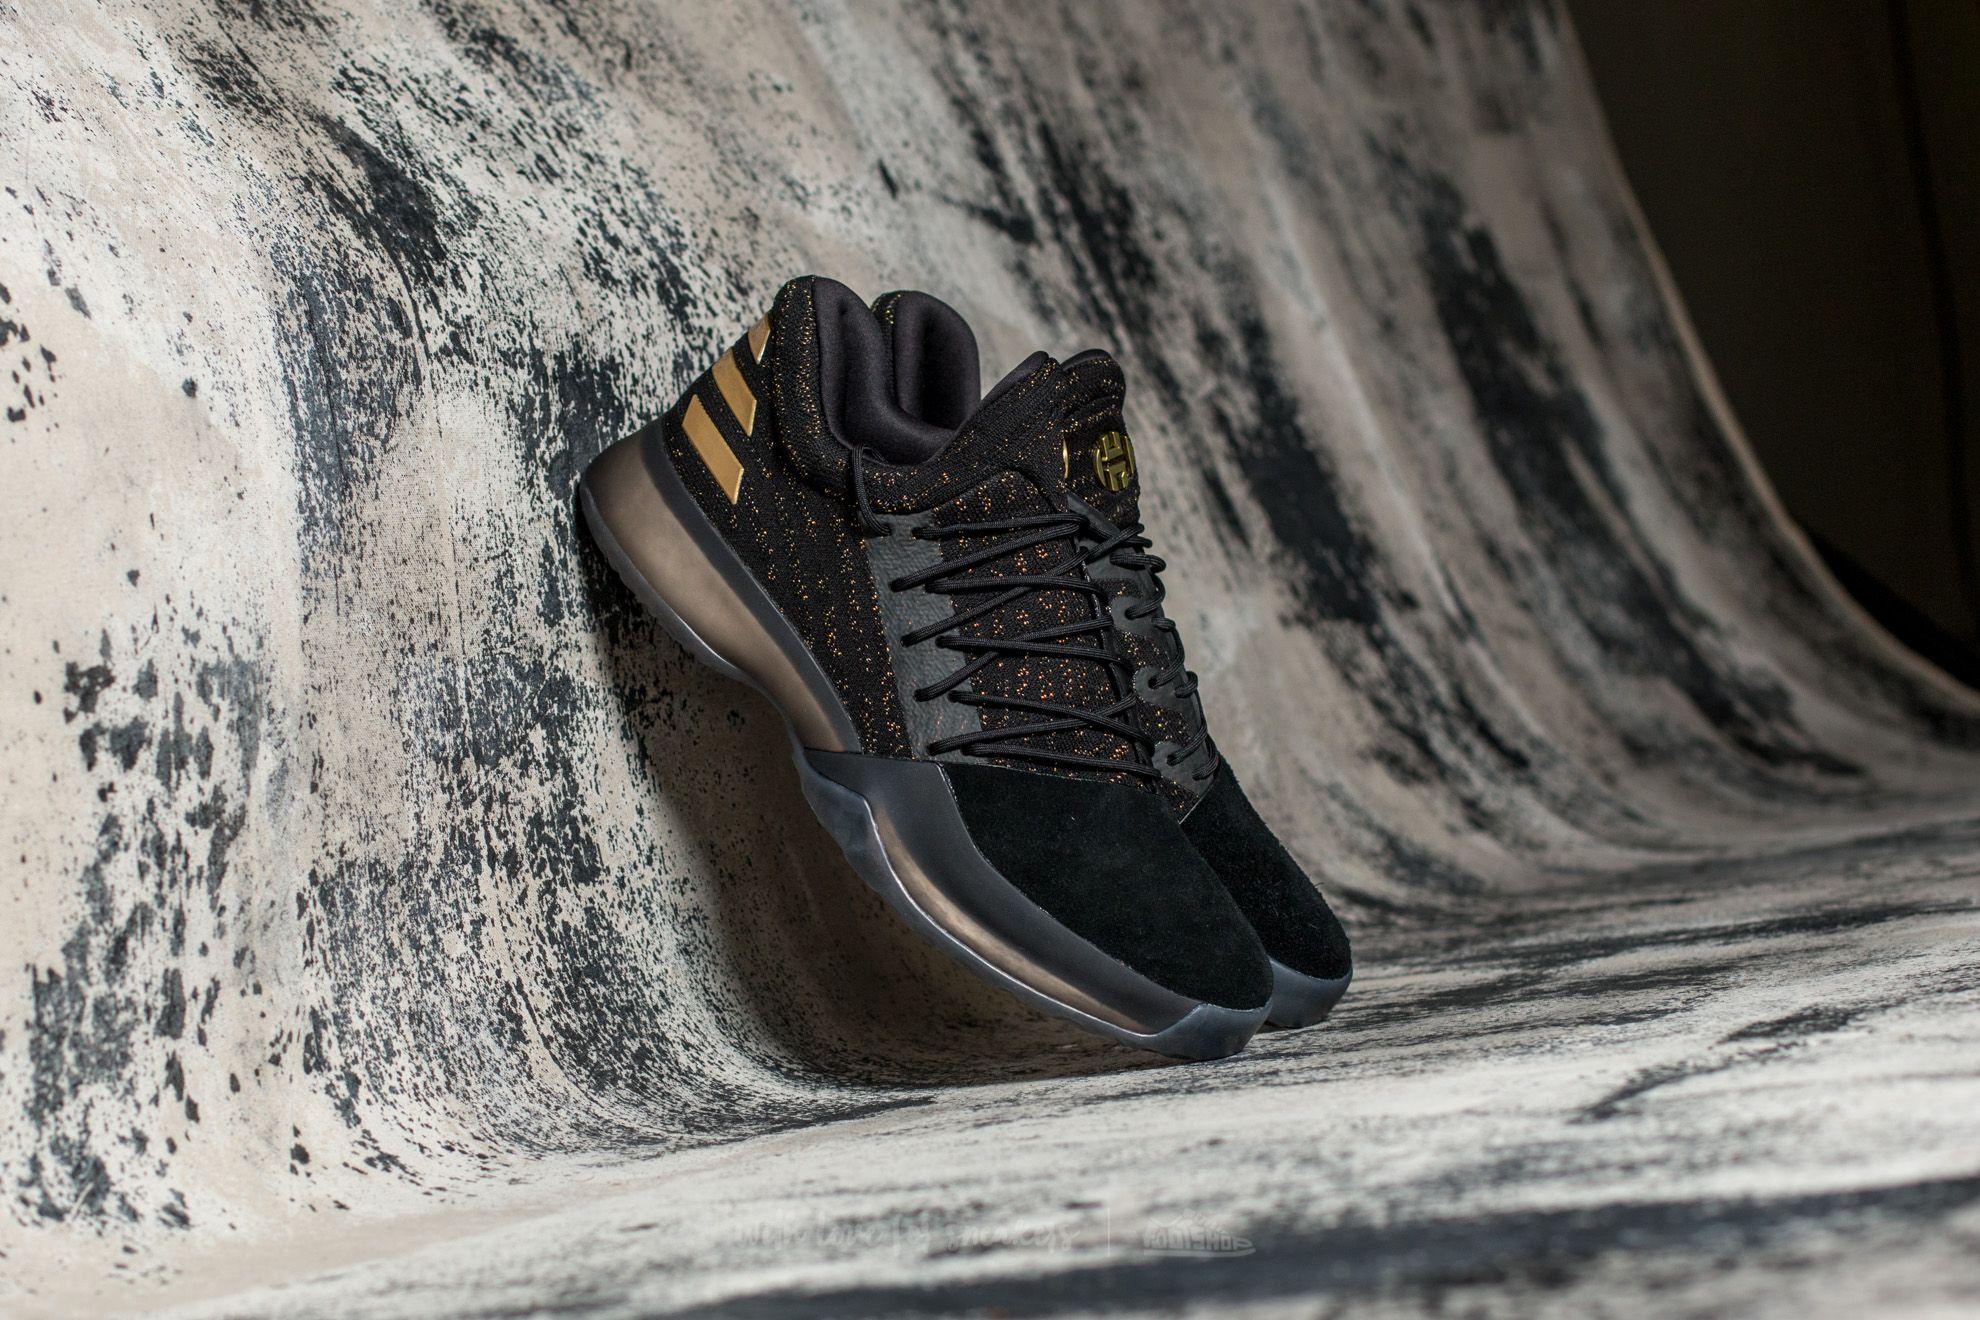 adidas Harden Vol. 1 Primeknit Black  Gold  White  4062a278a